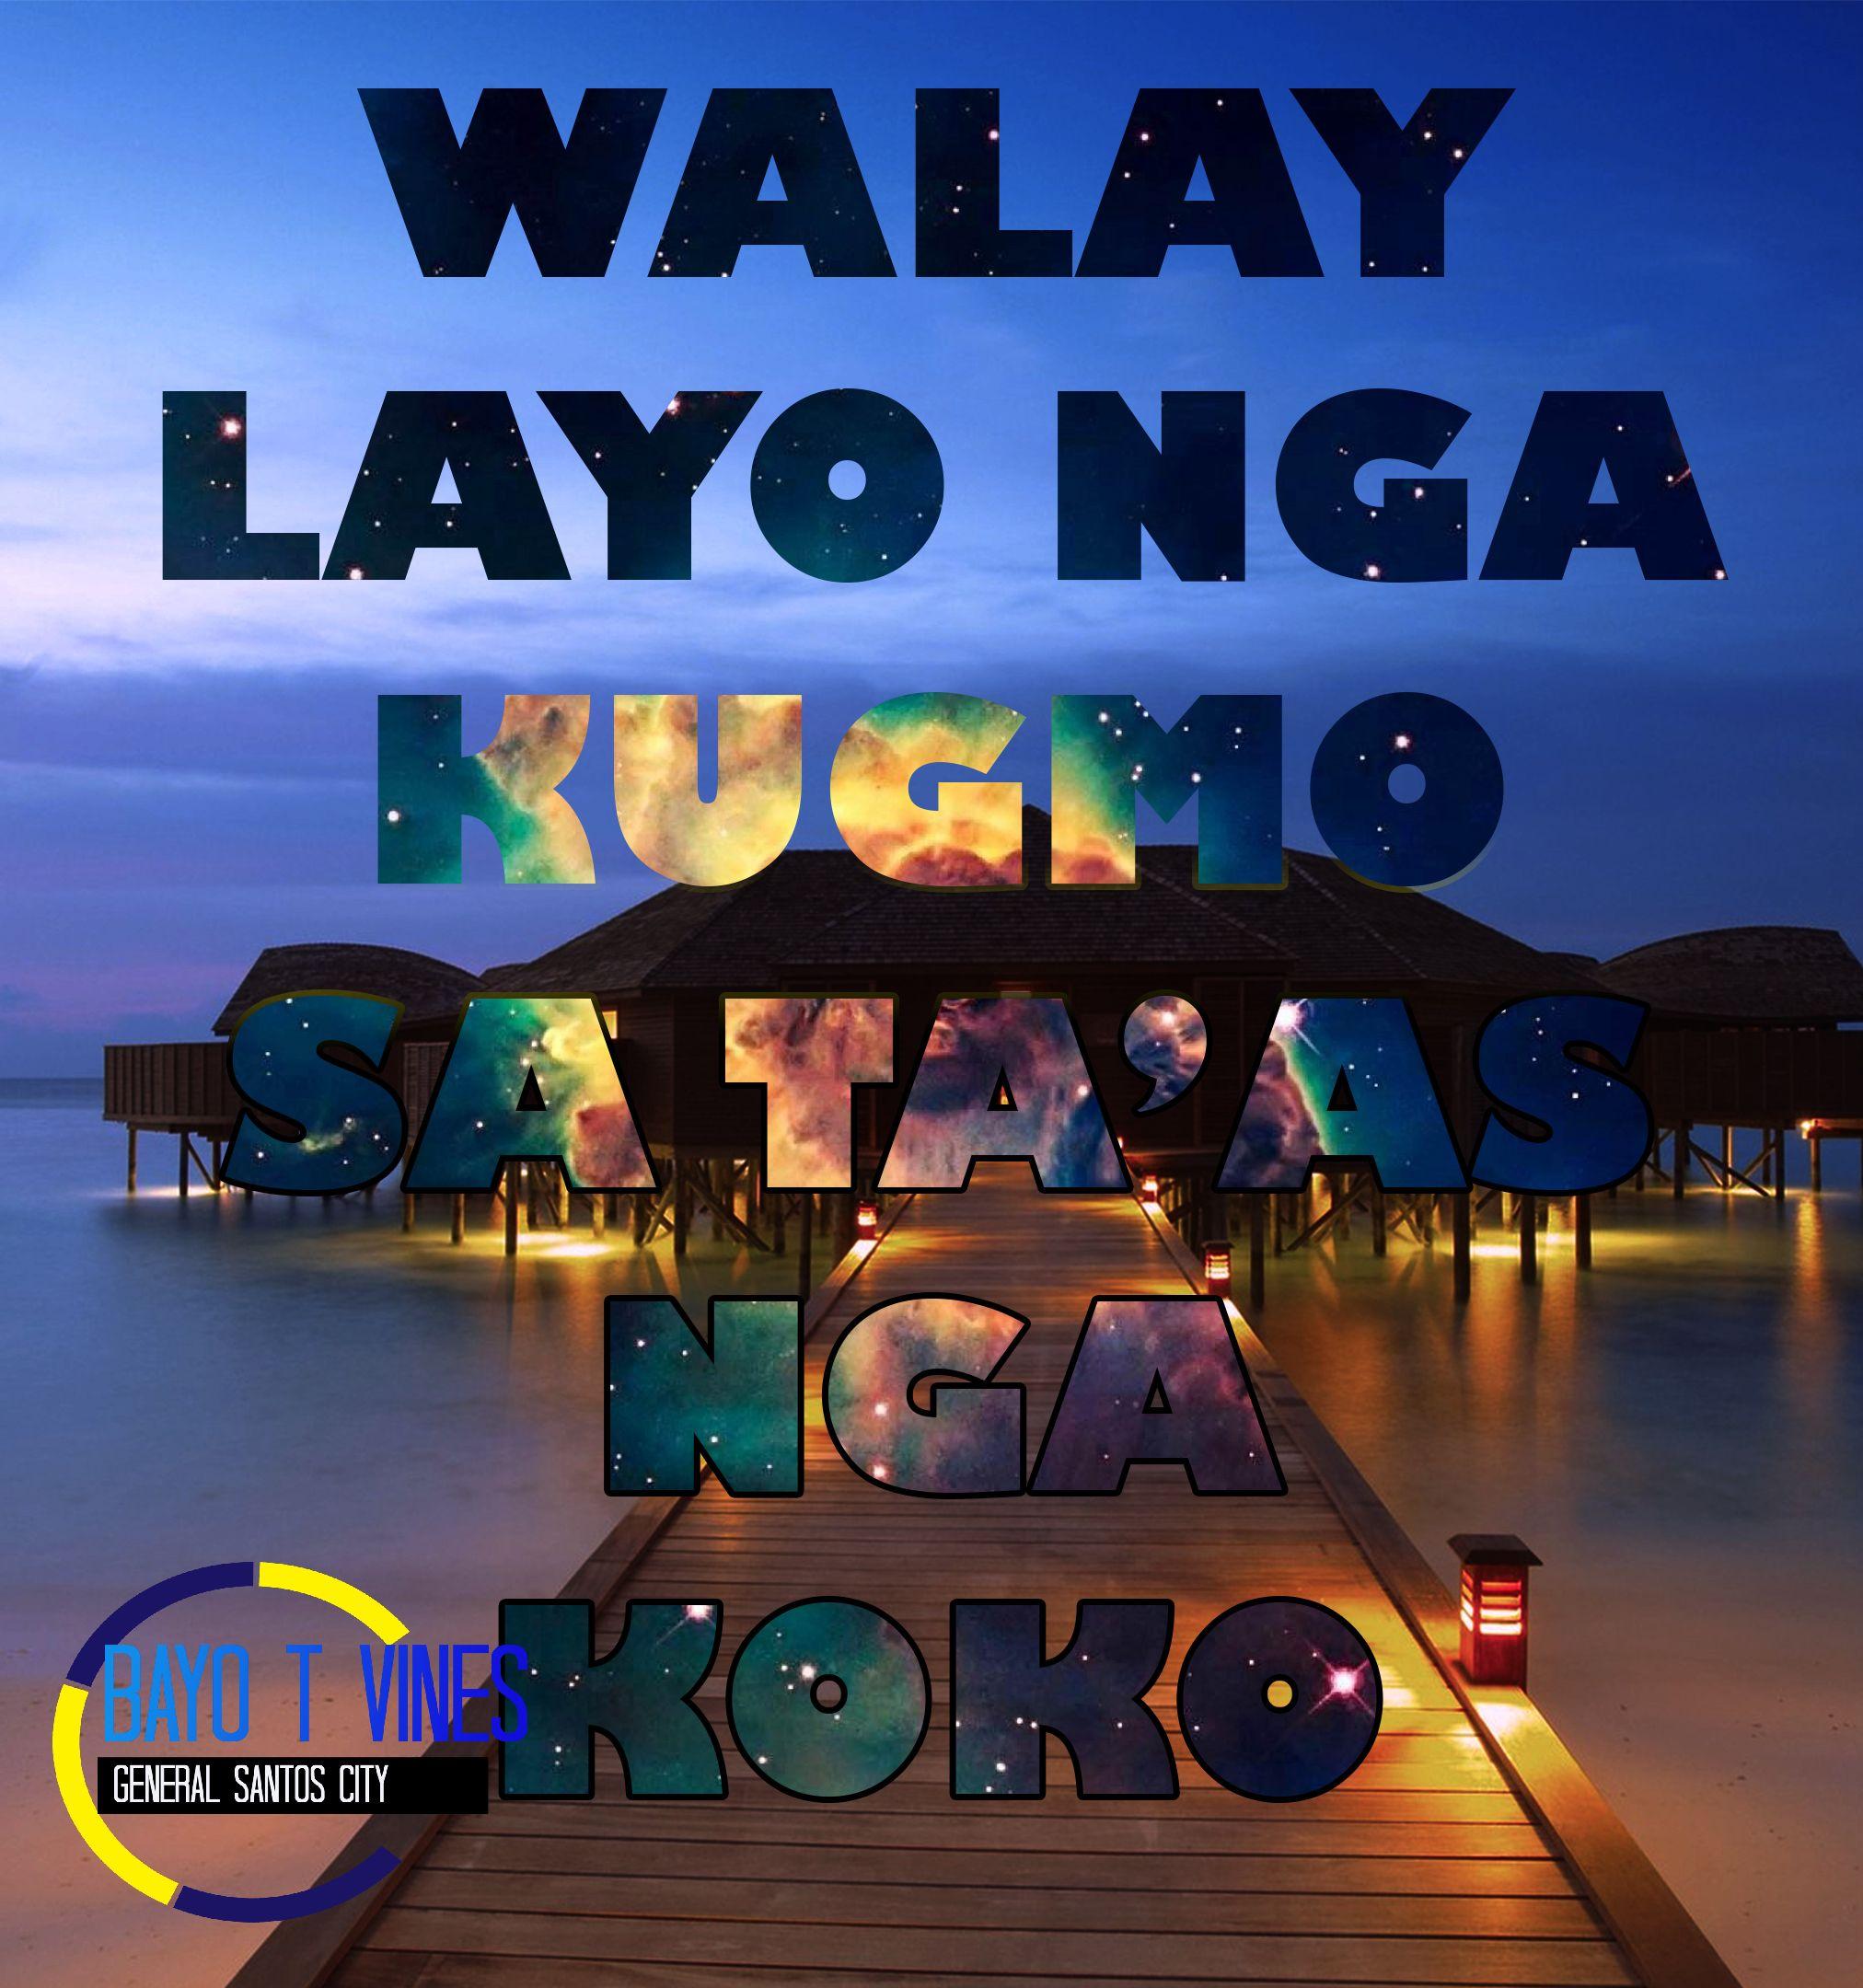 Bisaya Quotes By Bayo T Vines Bisaya Quotes Diy Vinyl Wisdom Quotes